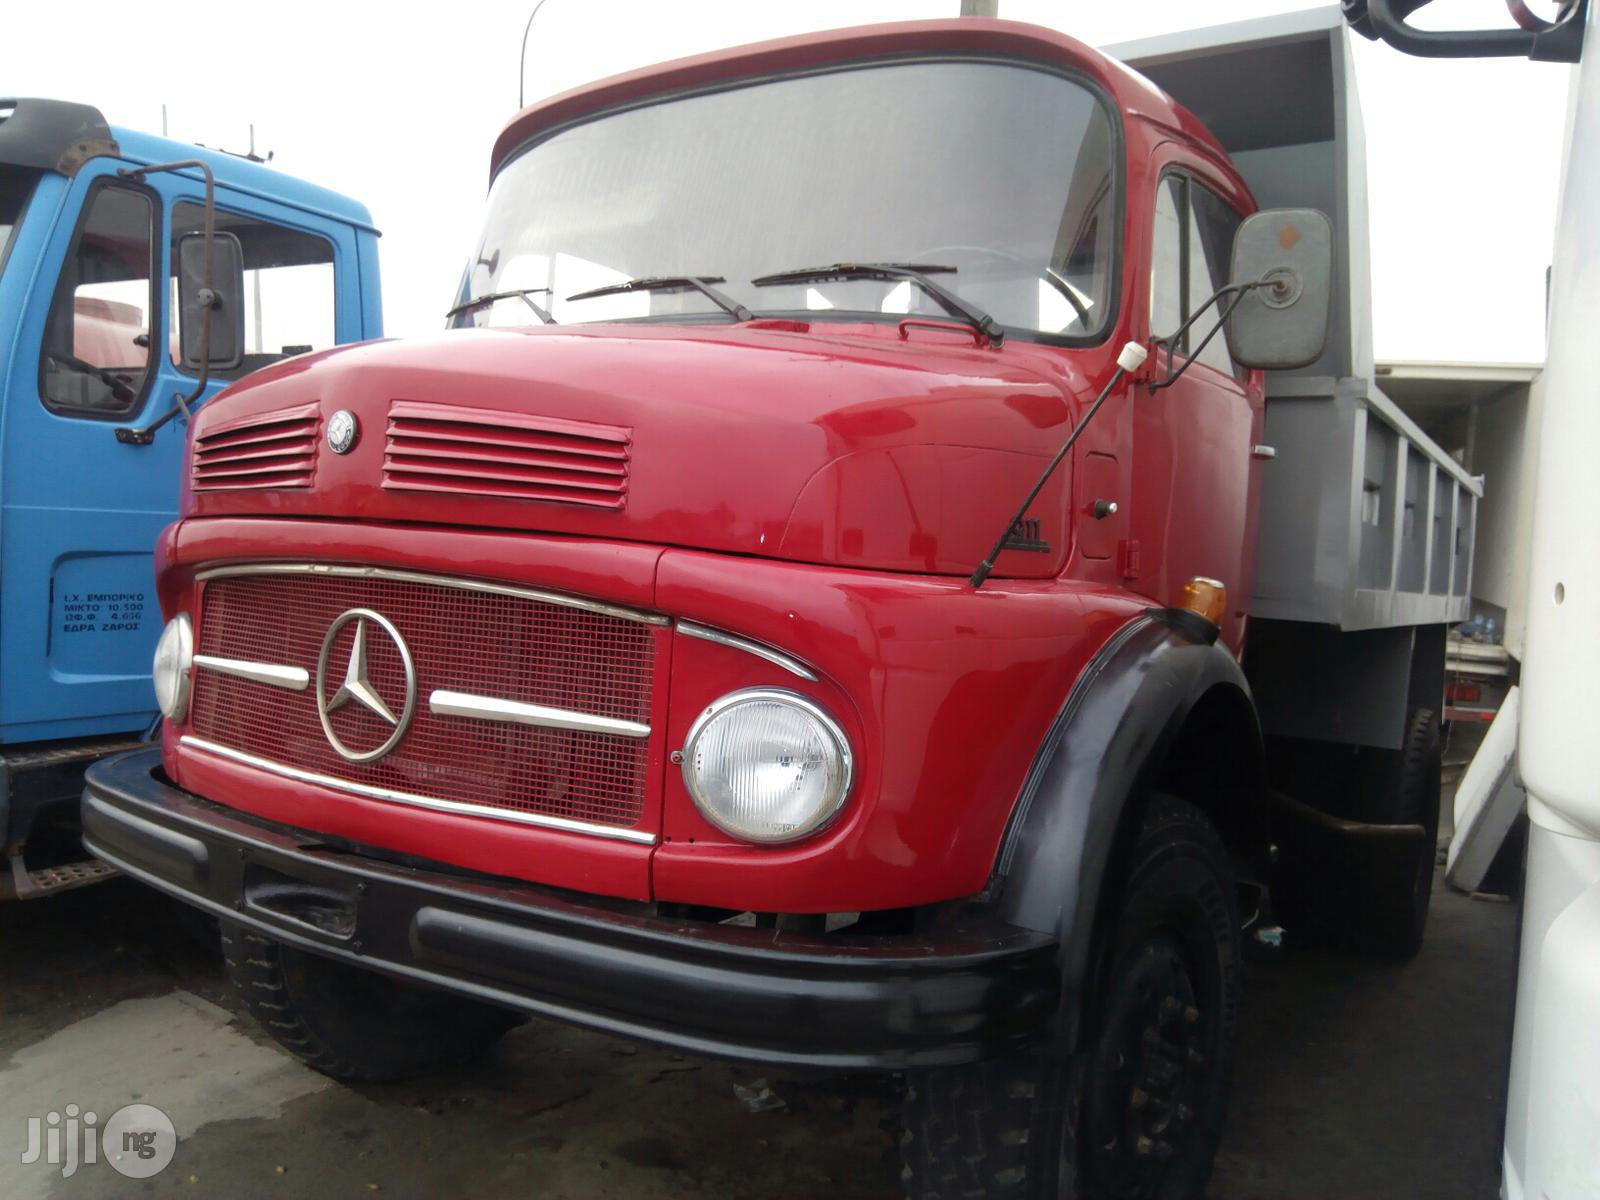 Mercedes Benz Tipper 1988   Trucks & Trailers for sale in Apapa, Lagos State, Nigeria